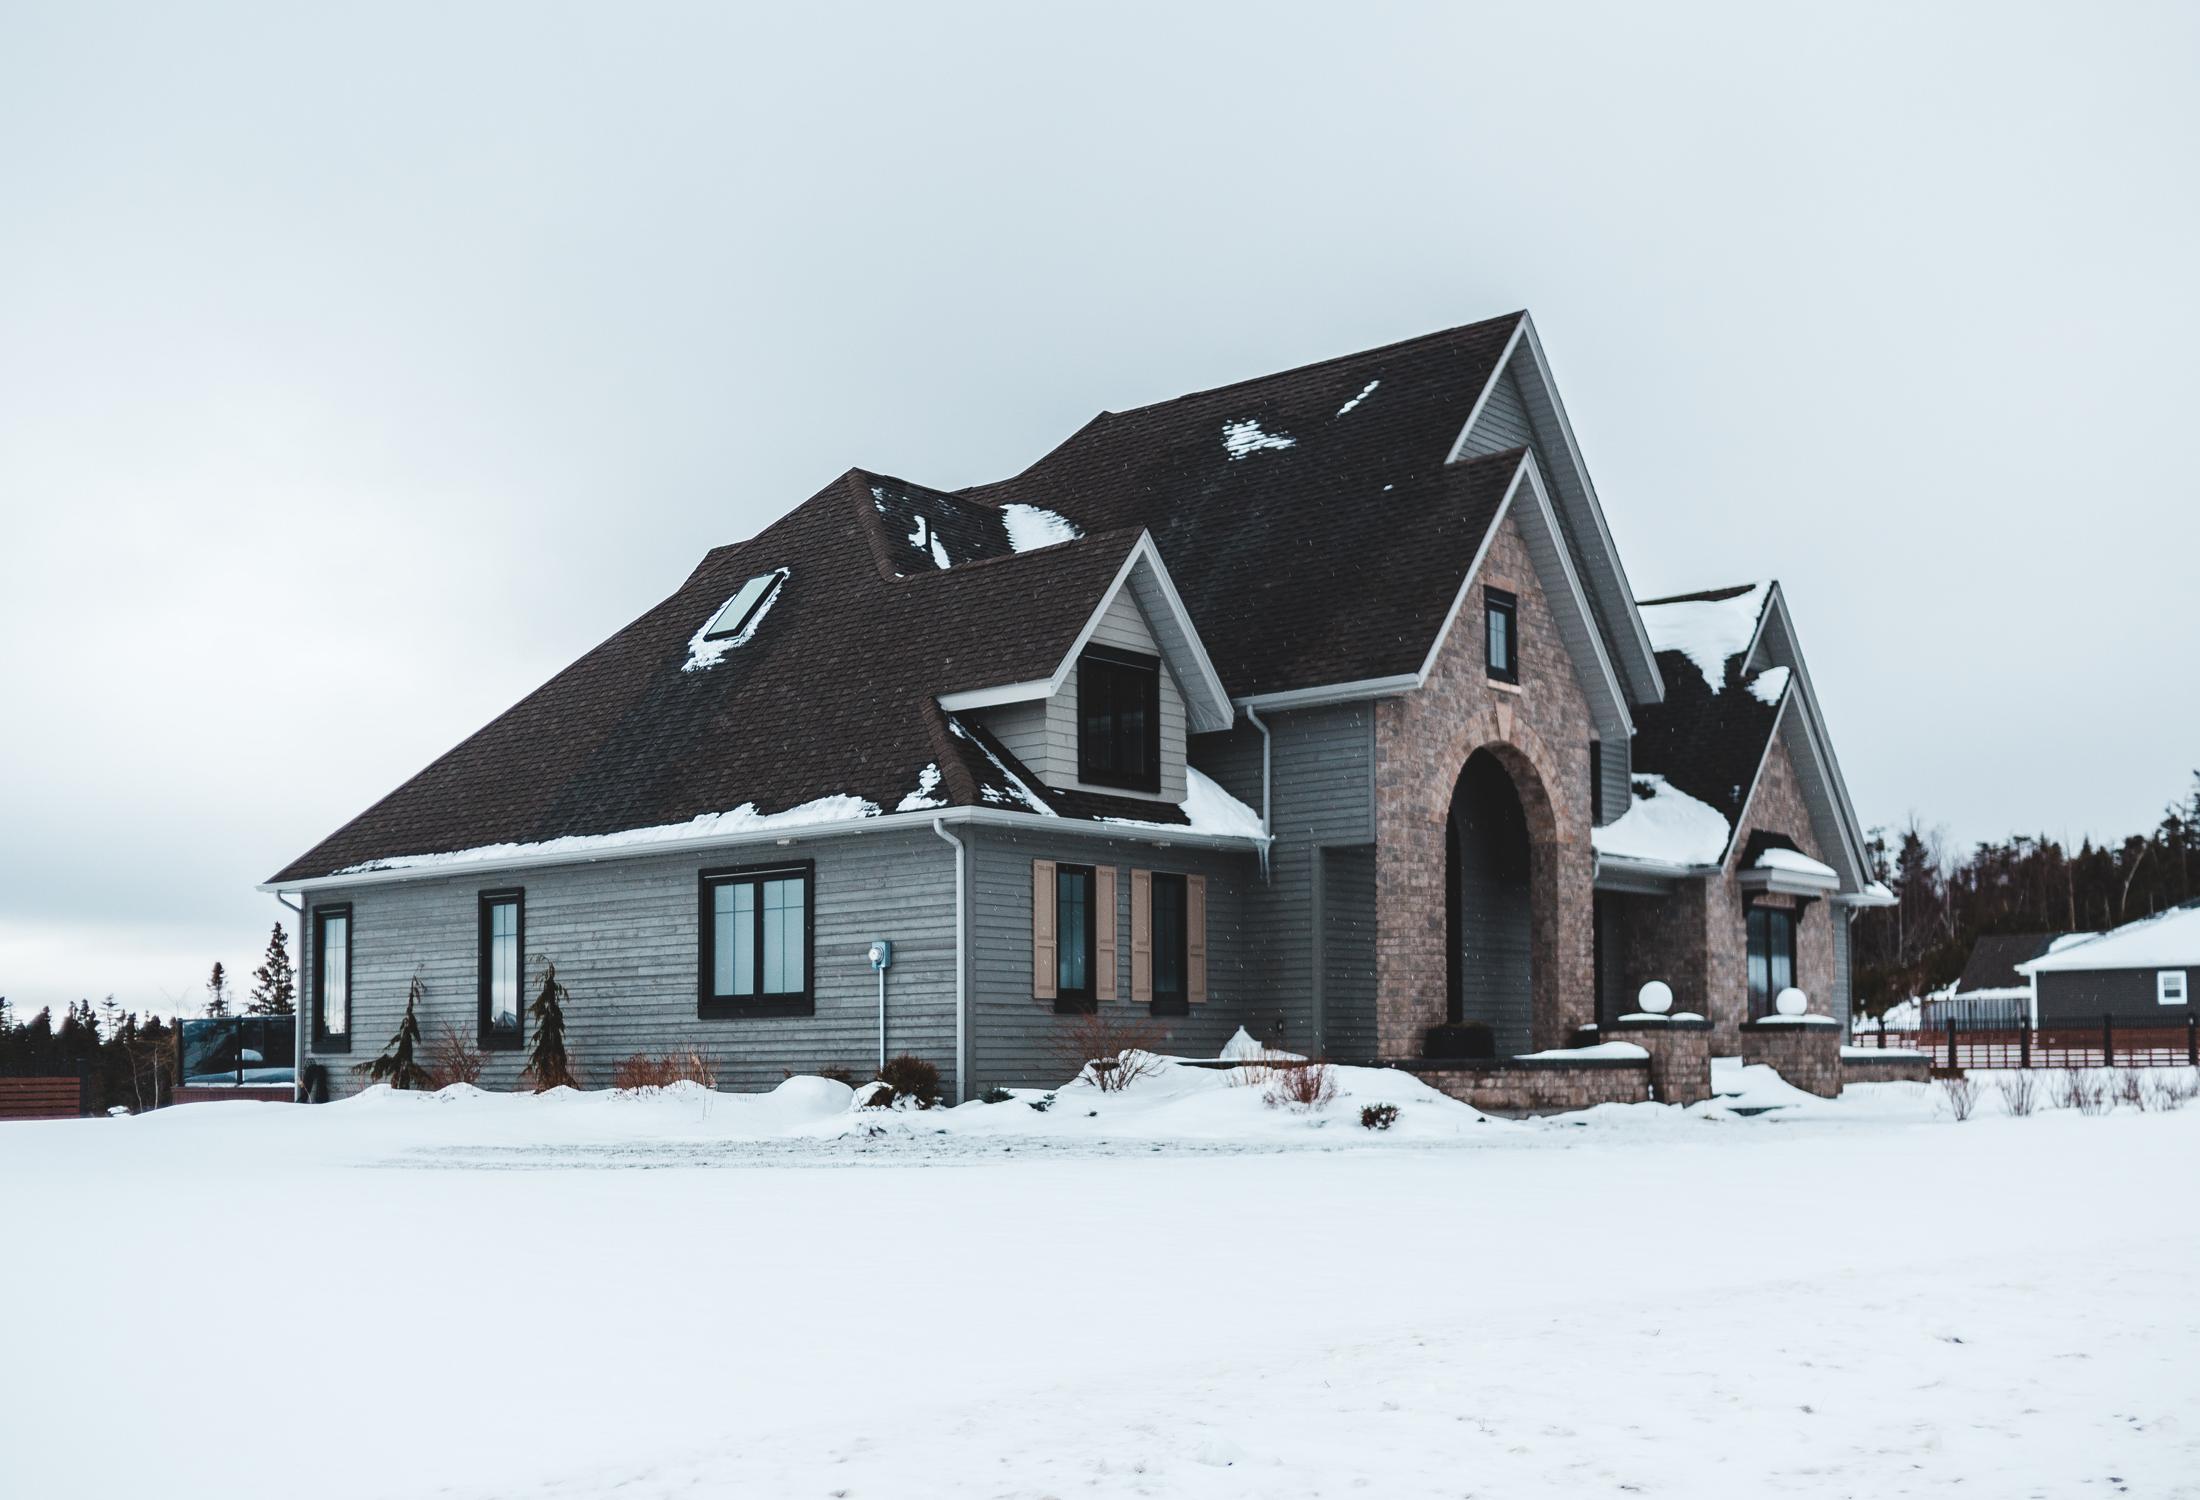 BrokerUnion Home Insurance